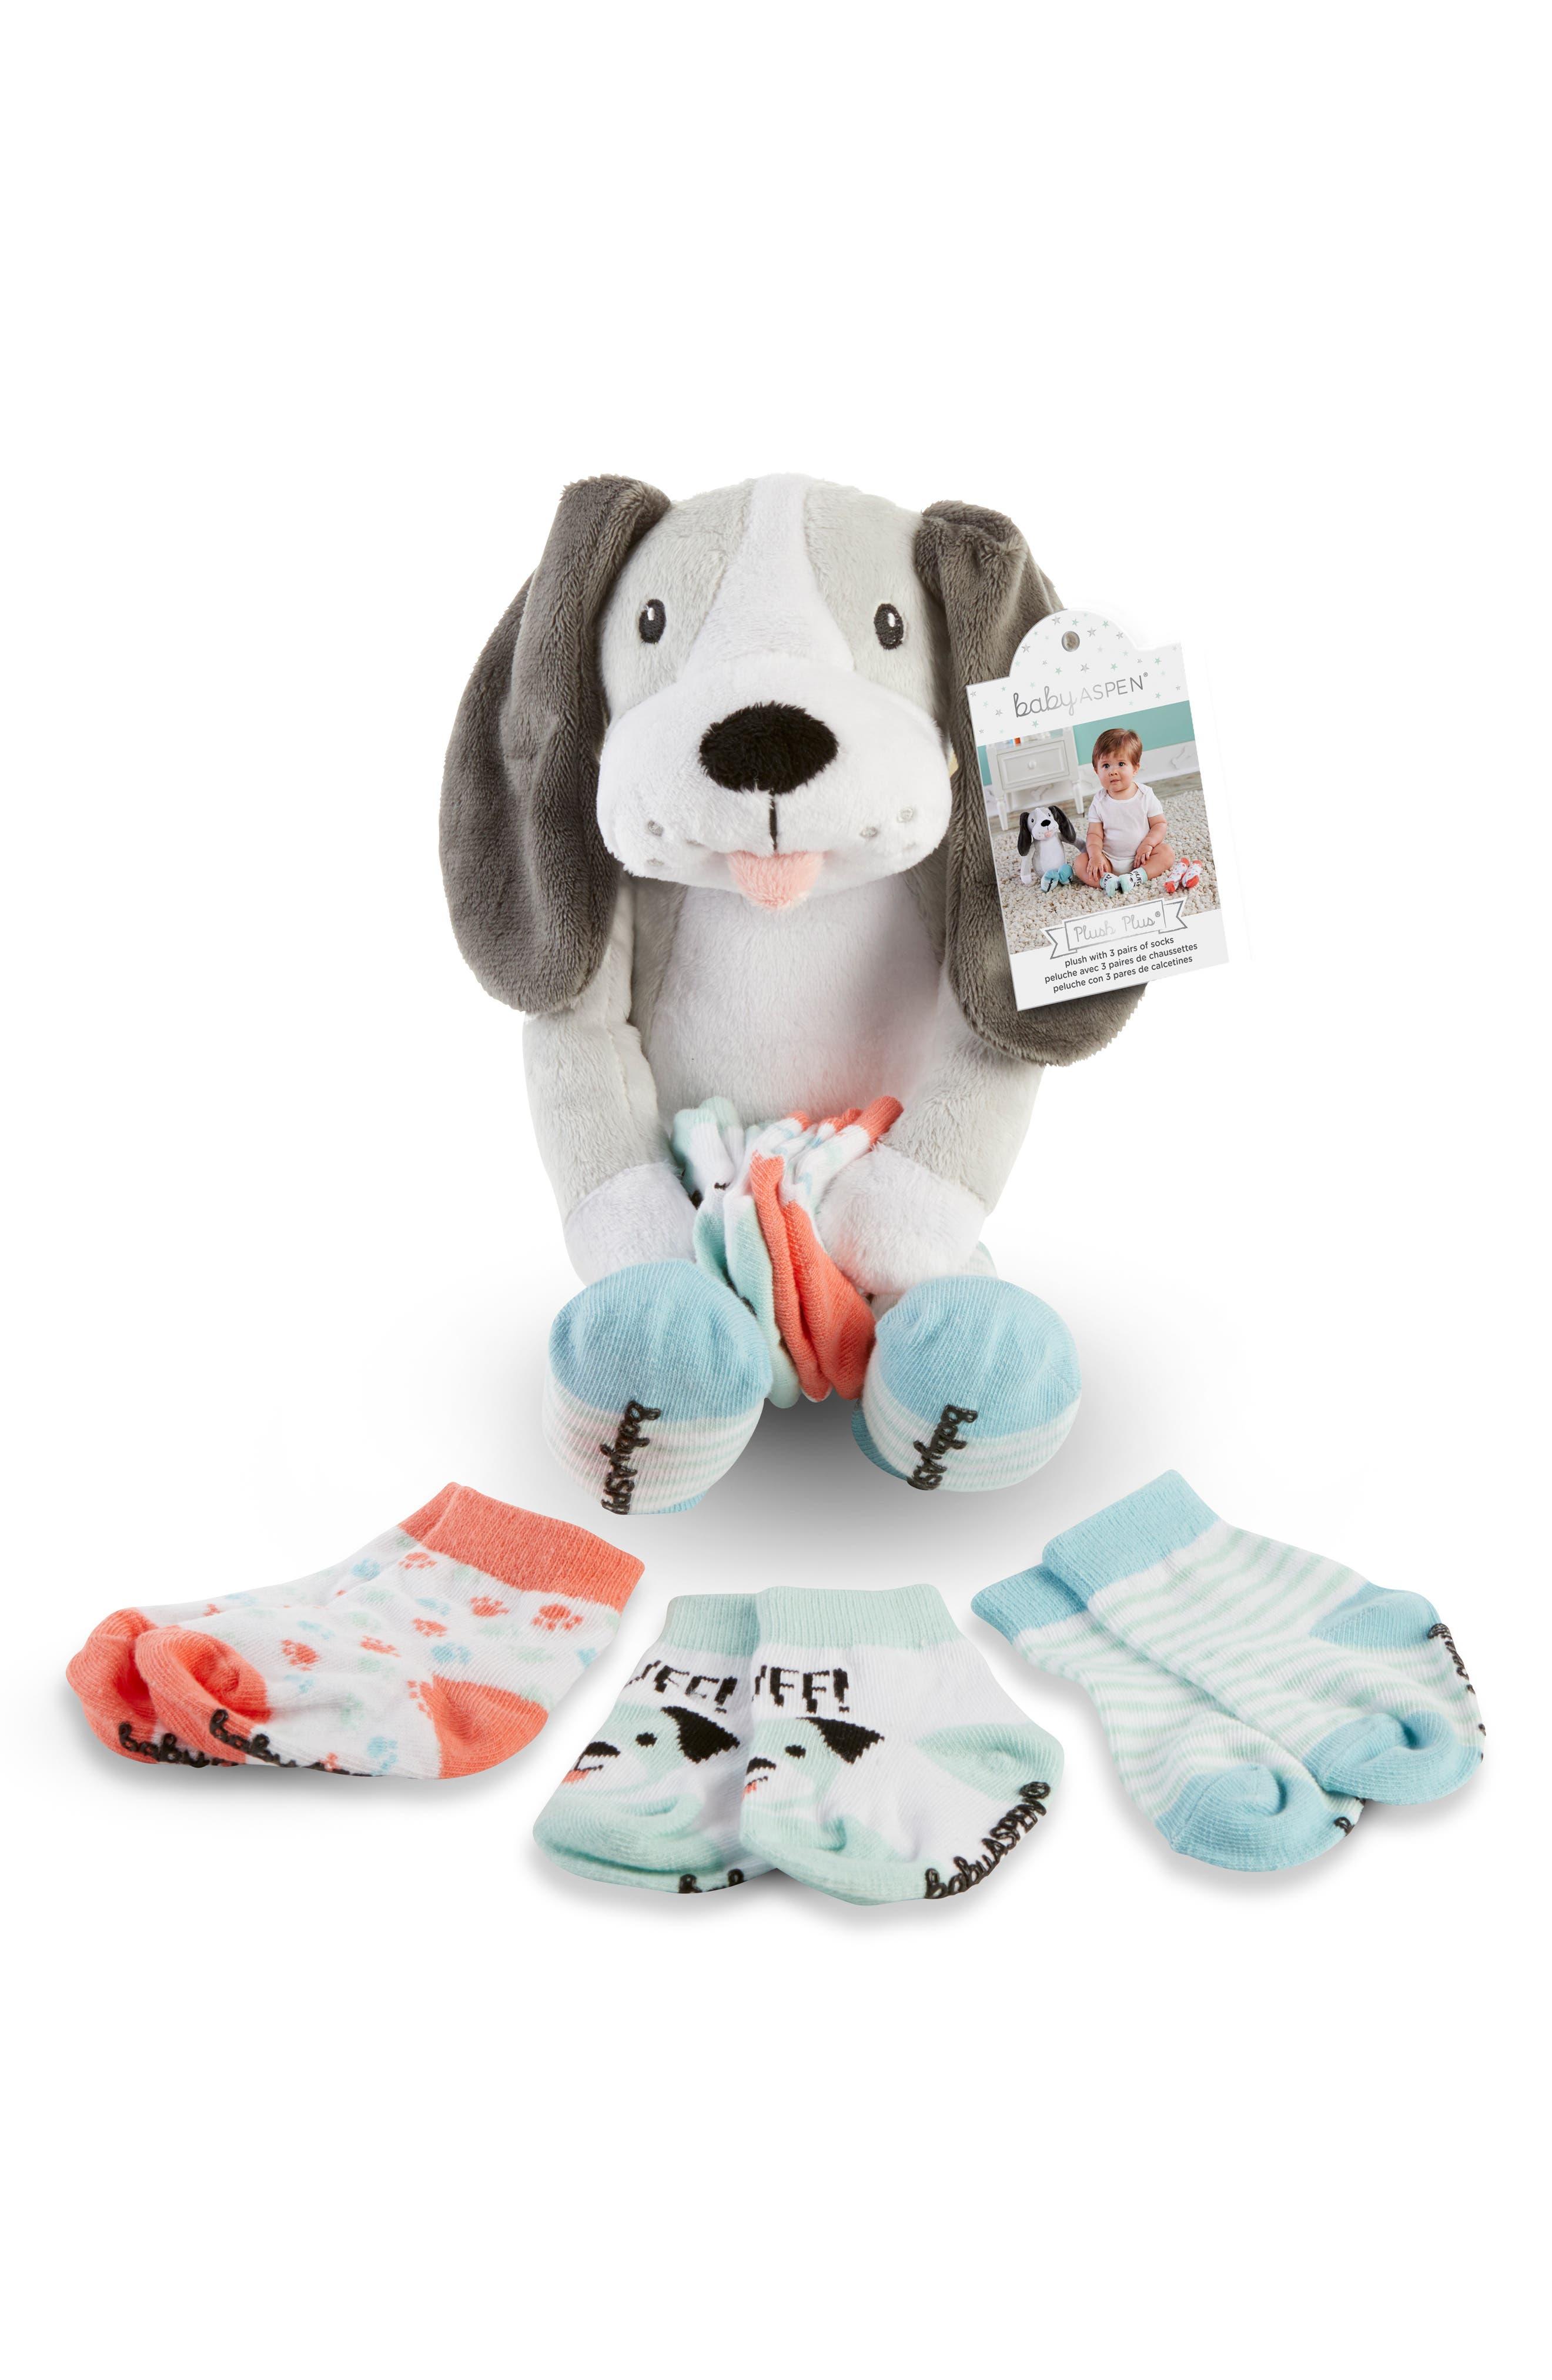 Infant Baby Aspen Puppy Plush Socks Bib Mitts  Rattle Set